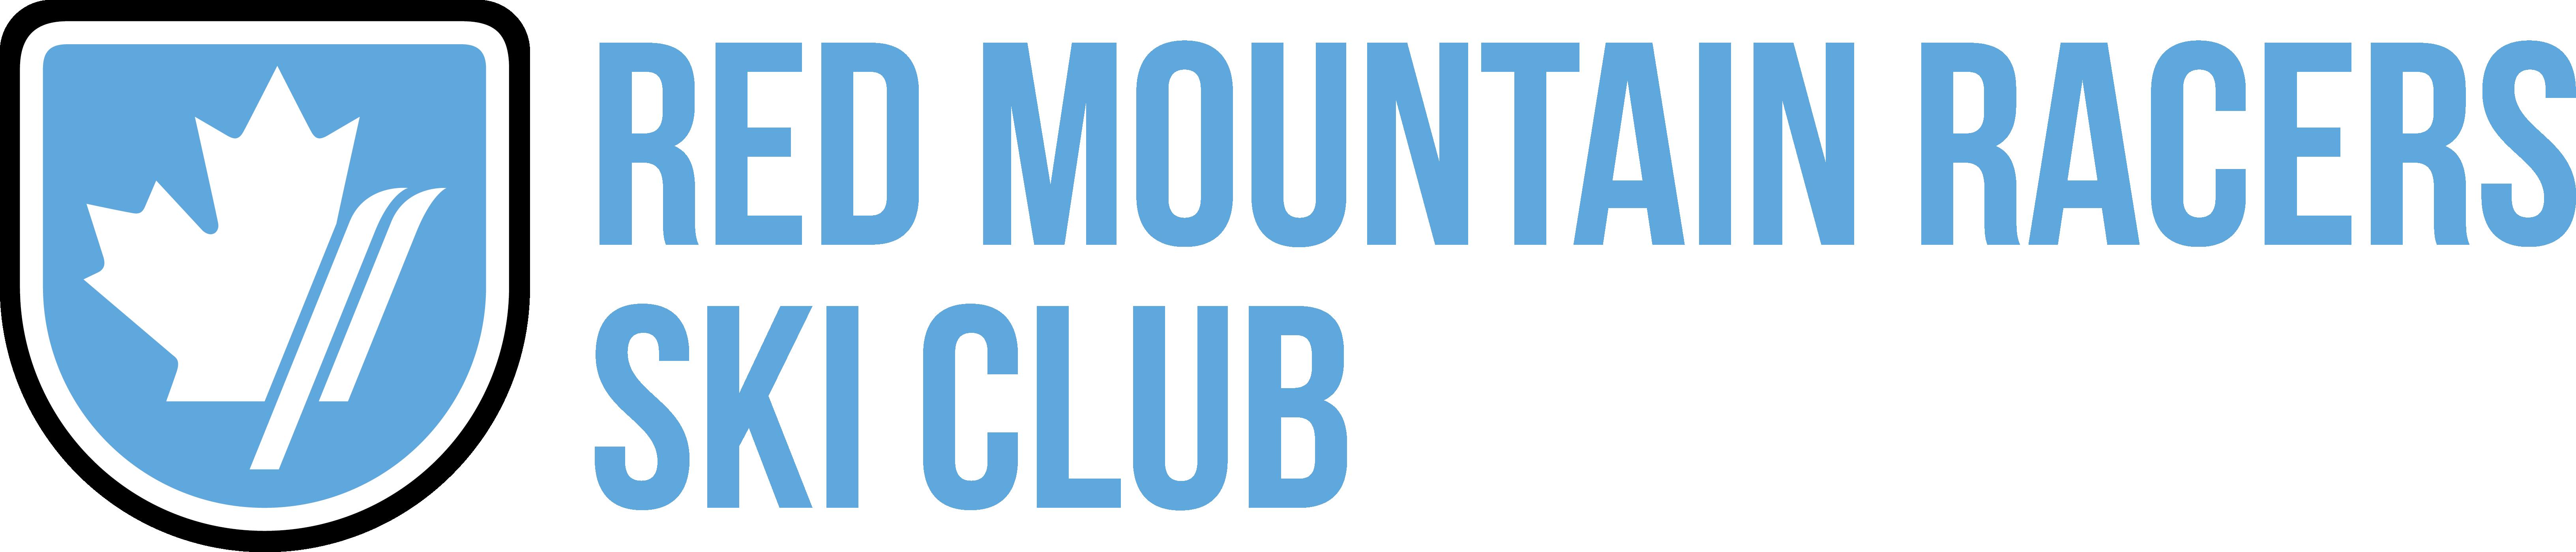 Red Mountain Racers Ski Club